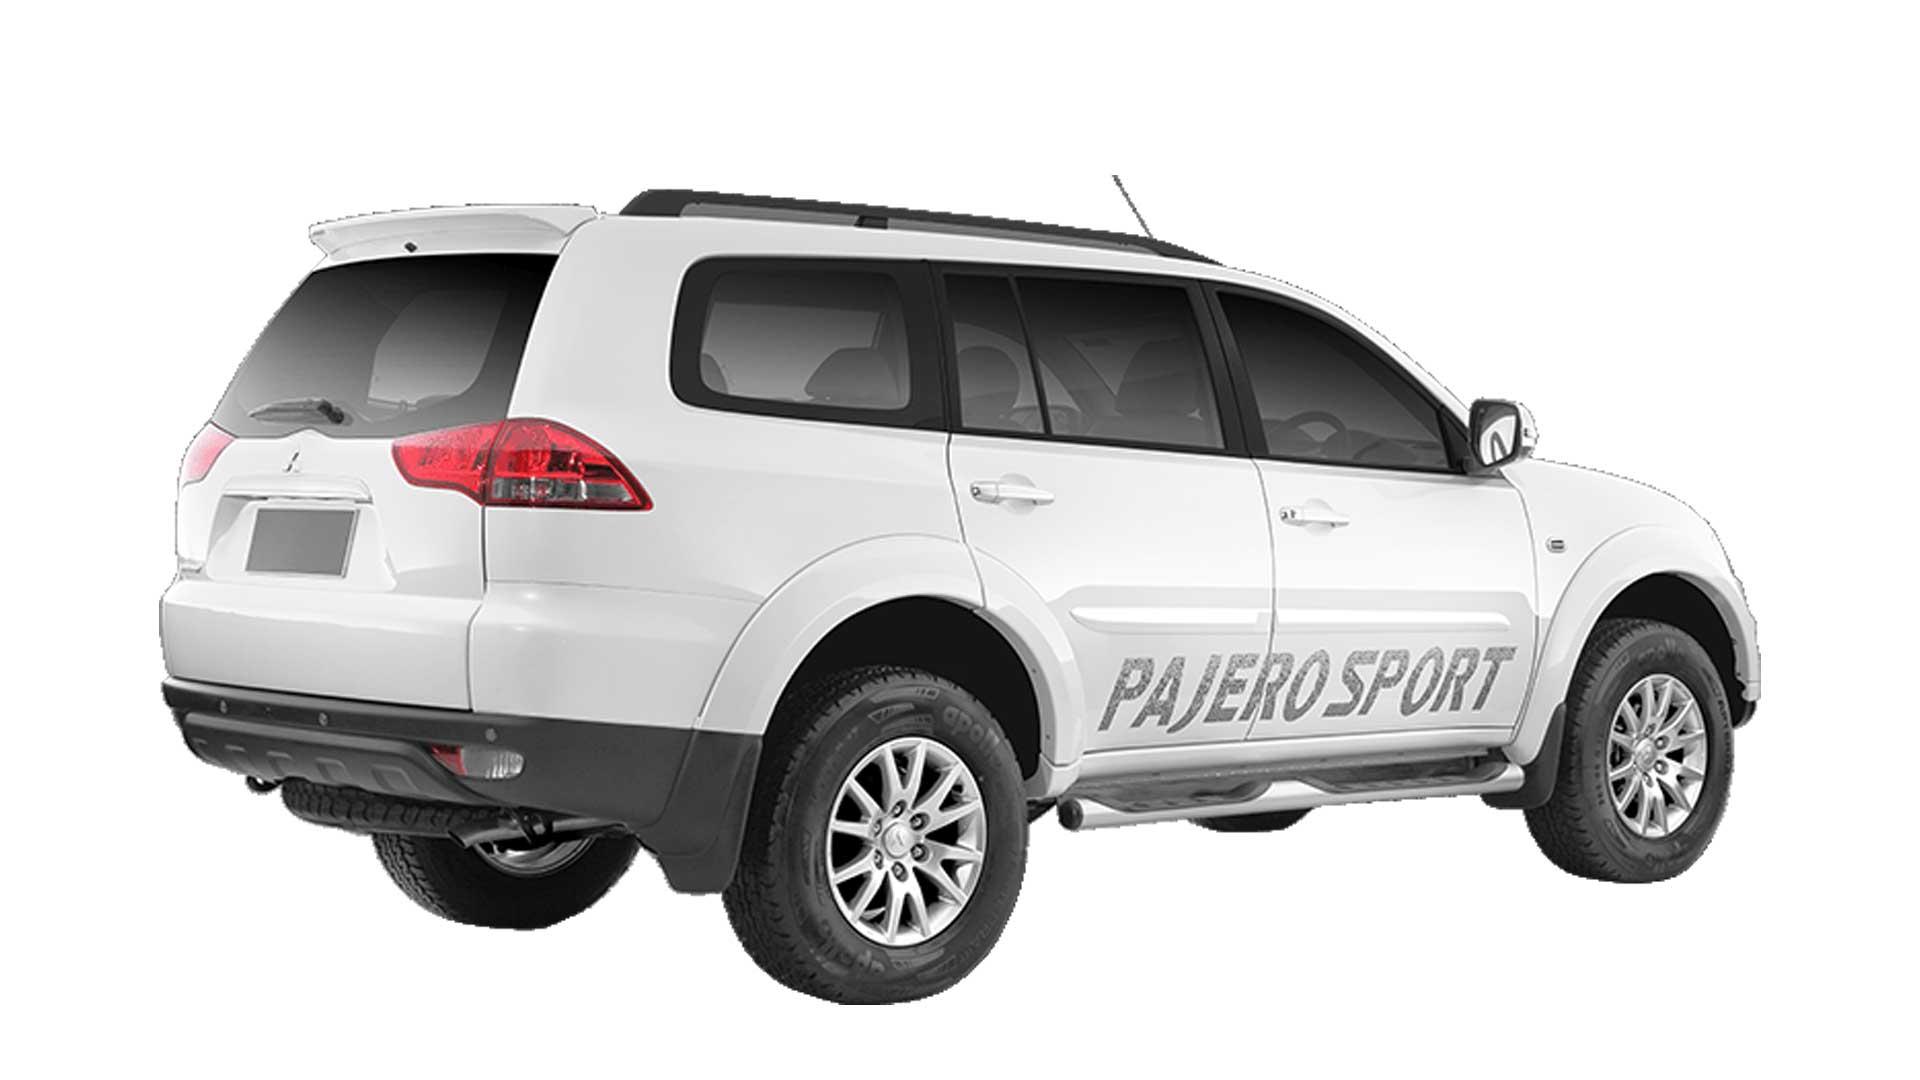 Mitsubishi-pajero-sport-2014-STD Compare